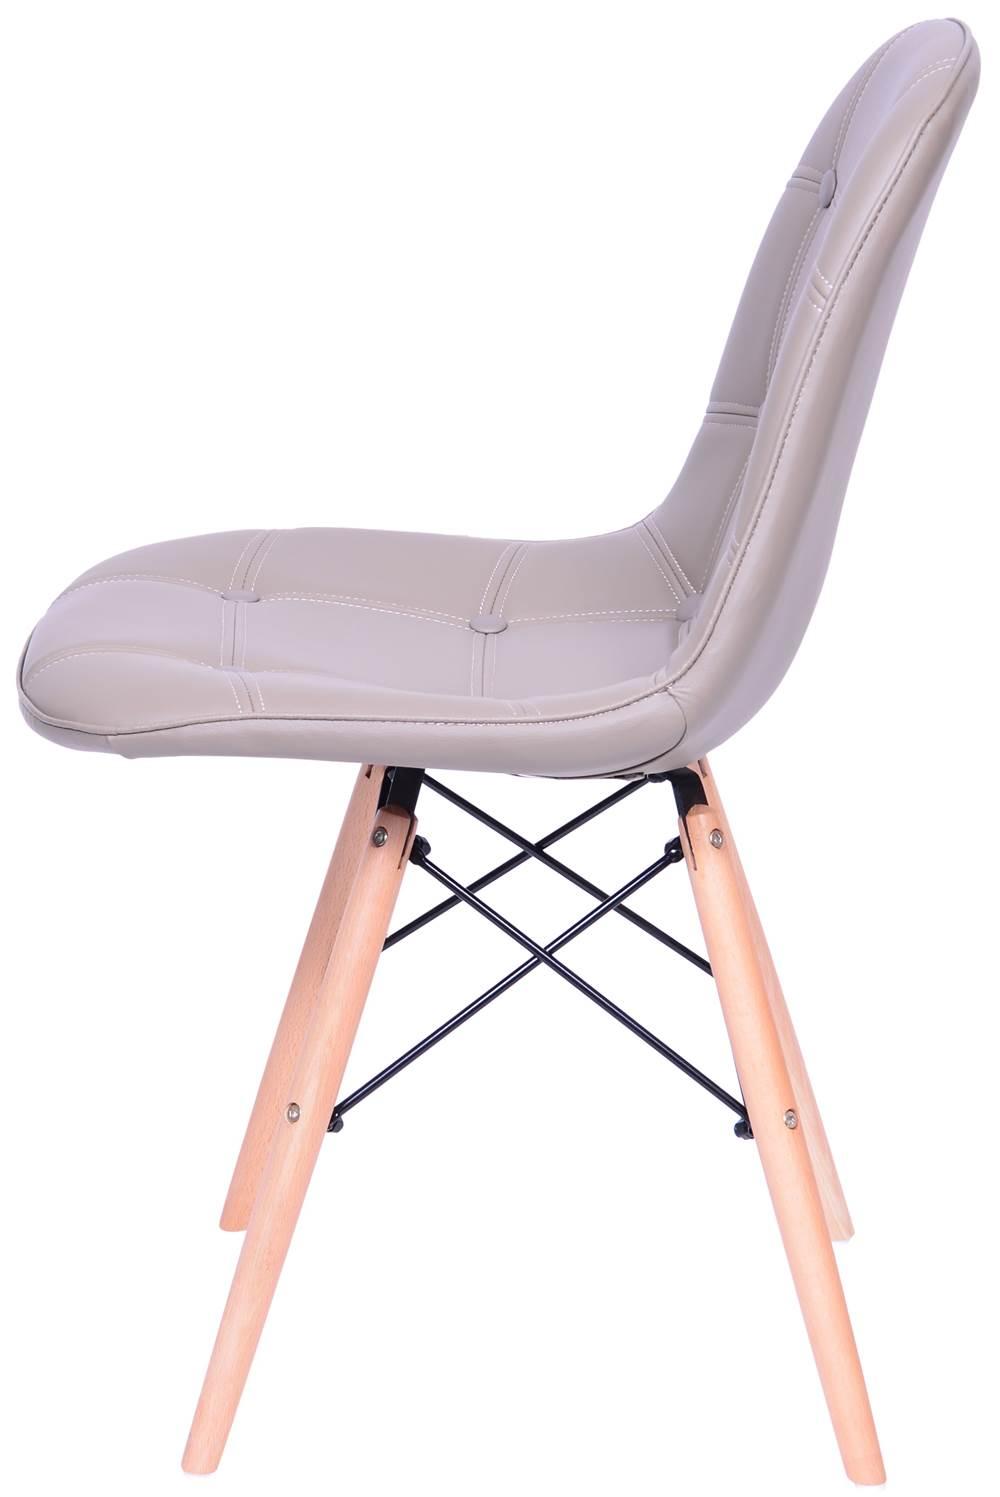 Cadeira Eames Botone Fendi Base Madeira - 43609